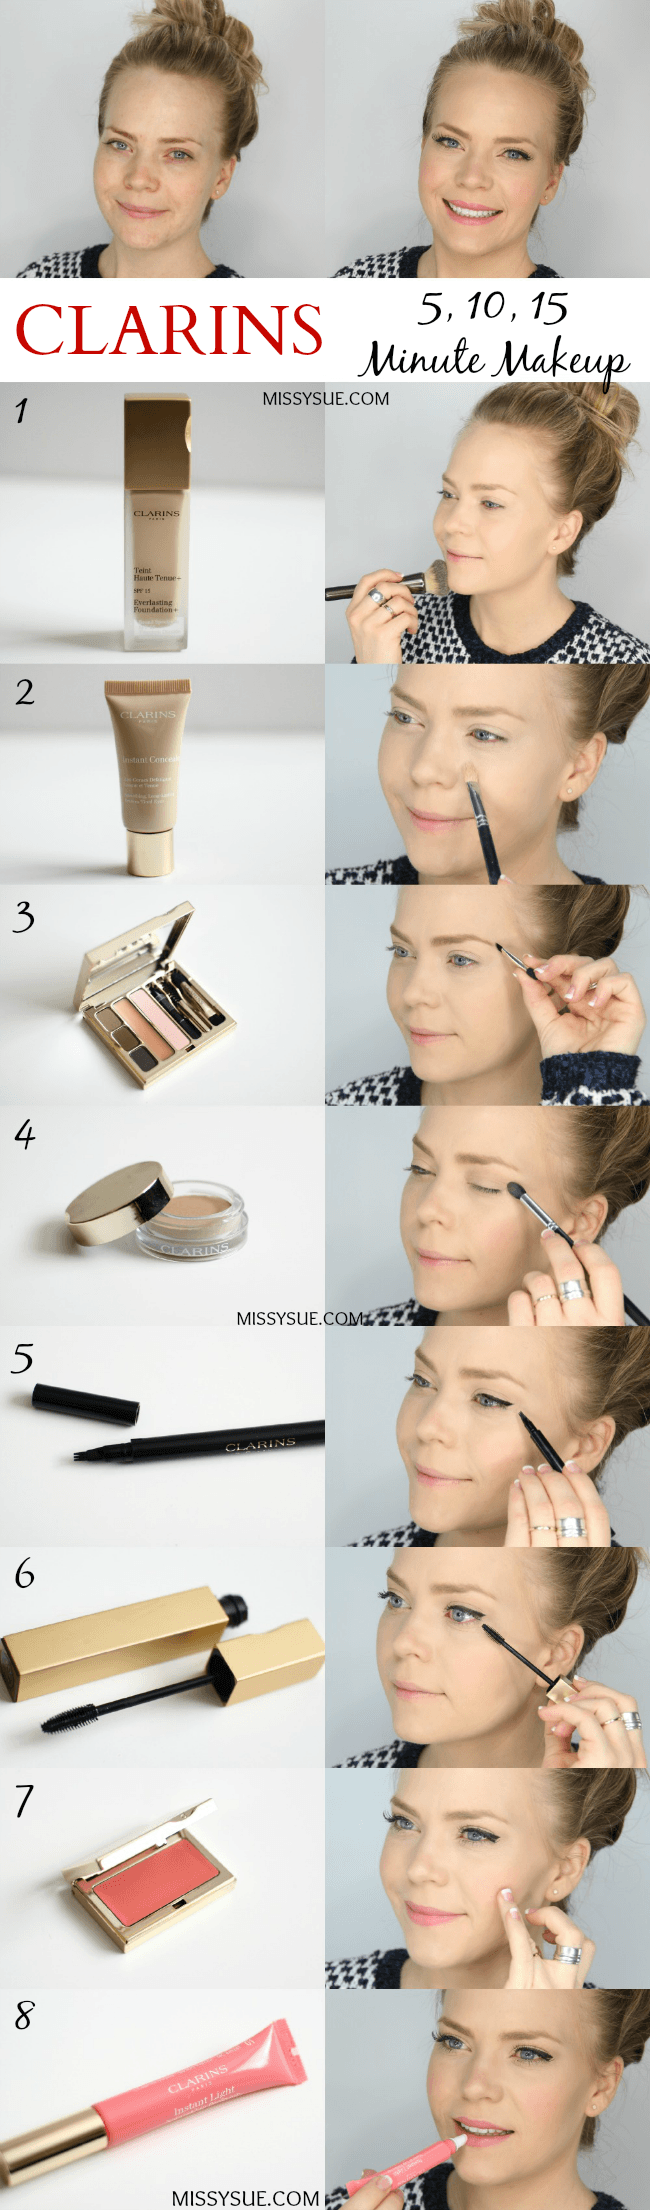 Clarins 5 10, 15 Minute Makeup